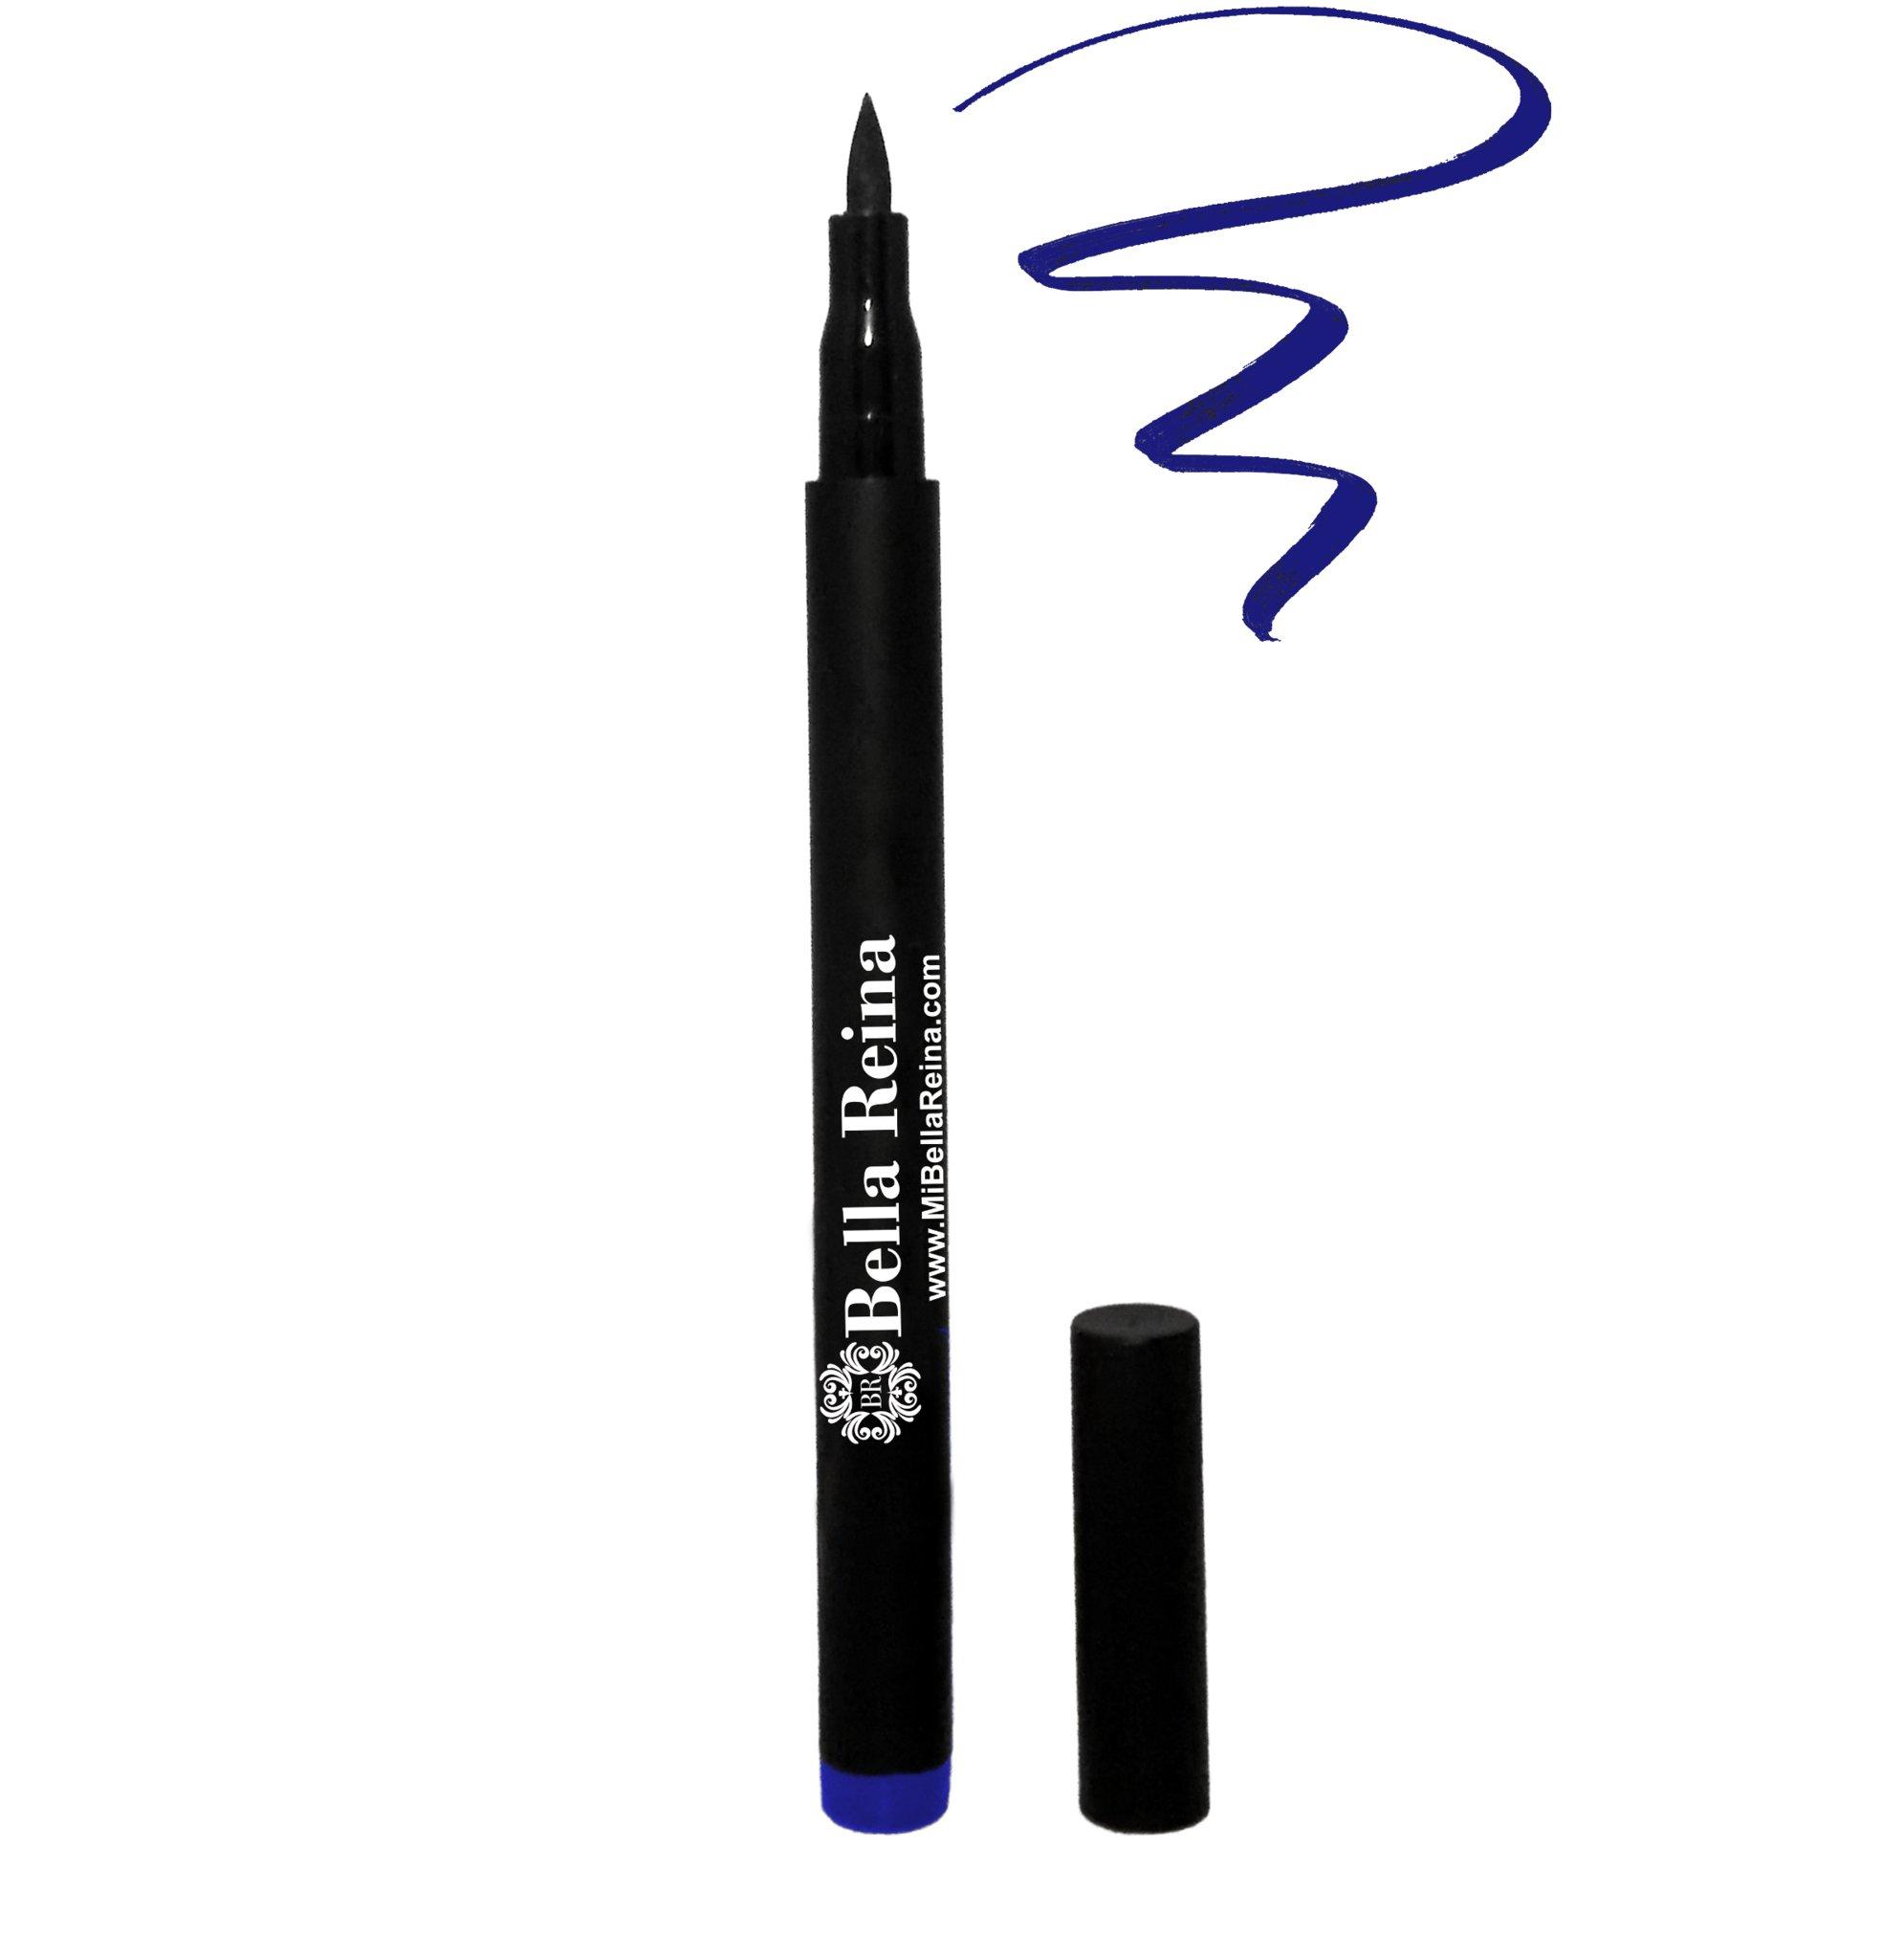 liquid eyeliner pen felt tip eyeliner waterproof bella reina. Black Bedroom Furniture Sets. Home Design Ideas